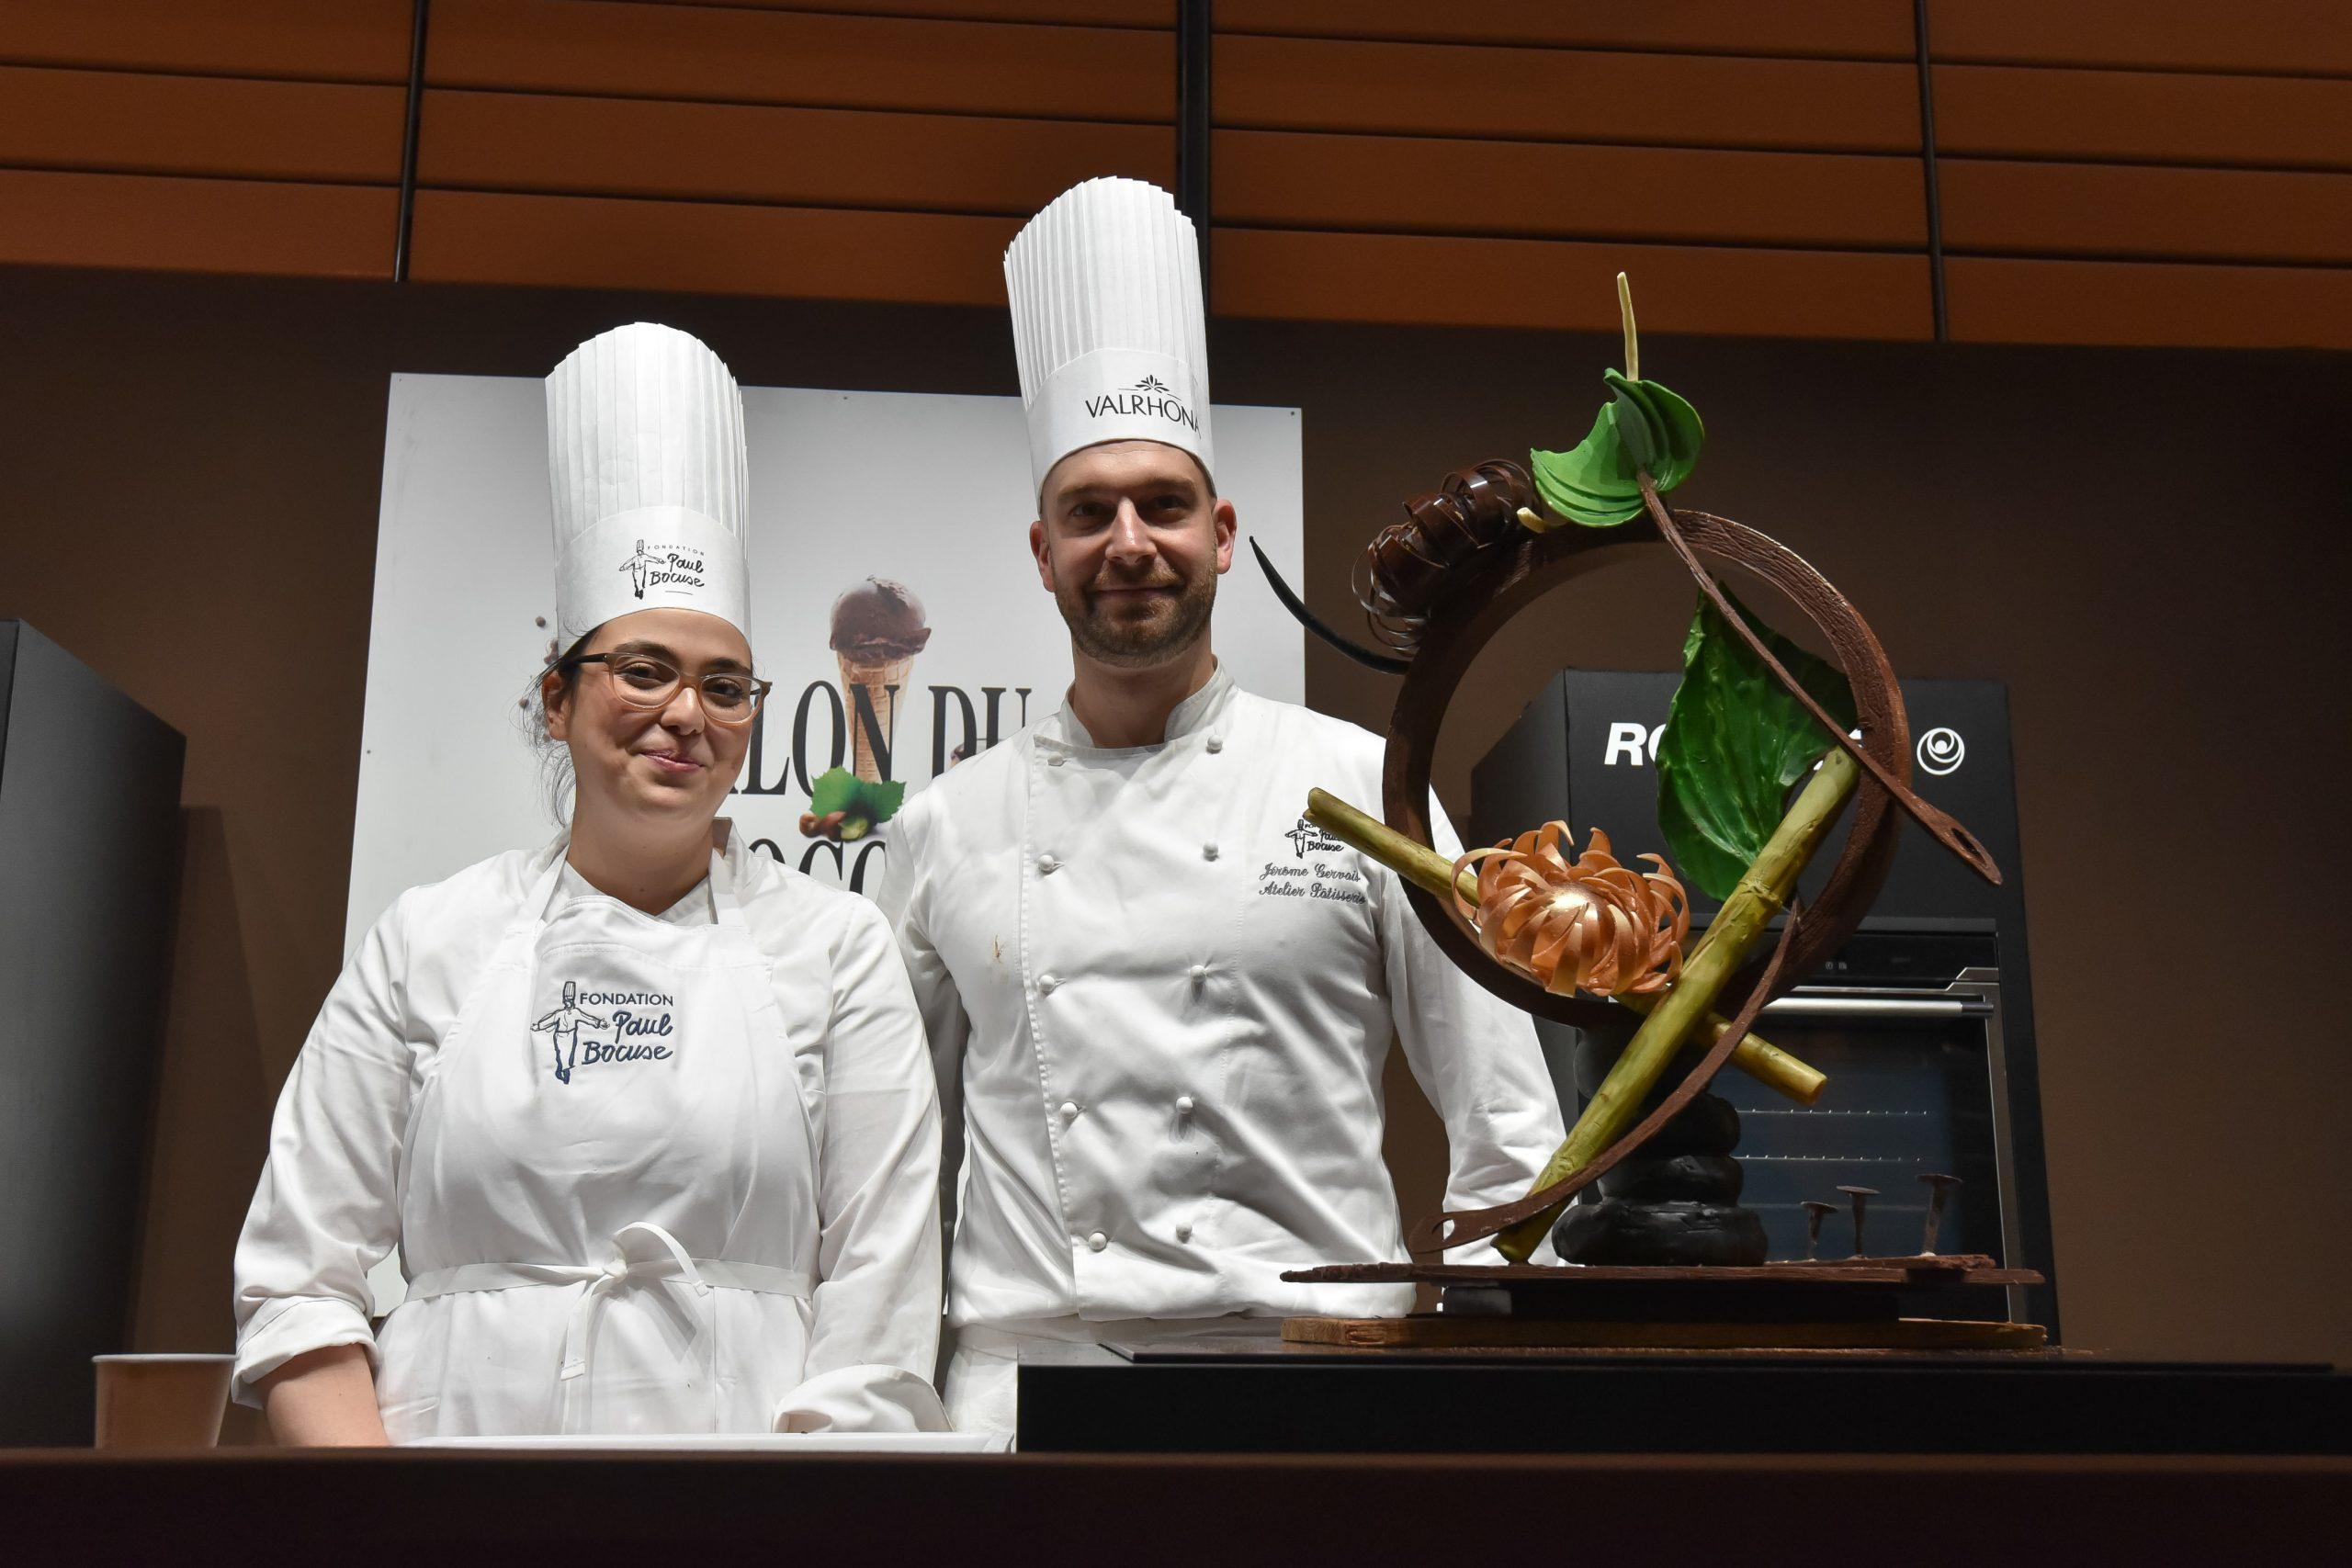 Salon Du Chocolat - Fondation Paul Bocuse avec Invitation Salon Du Chocolat Lyon 2017